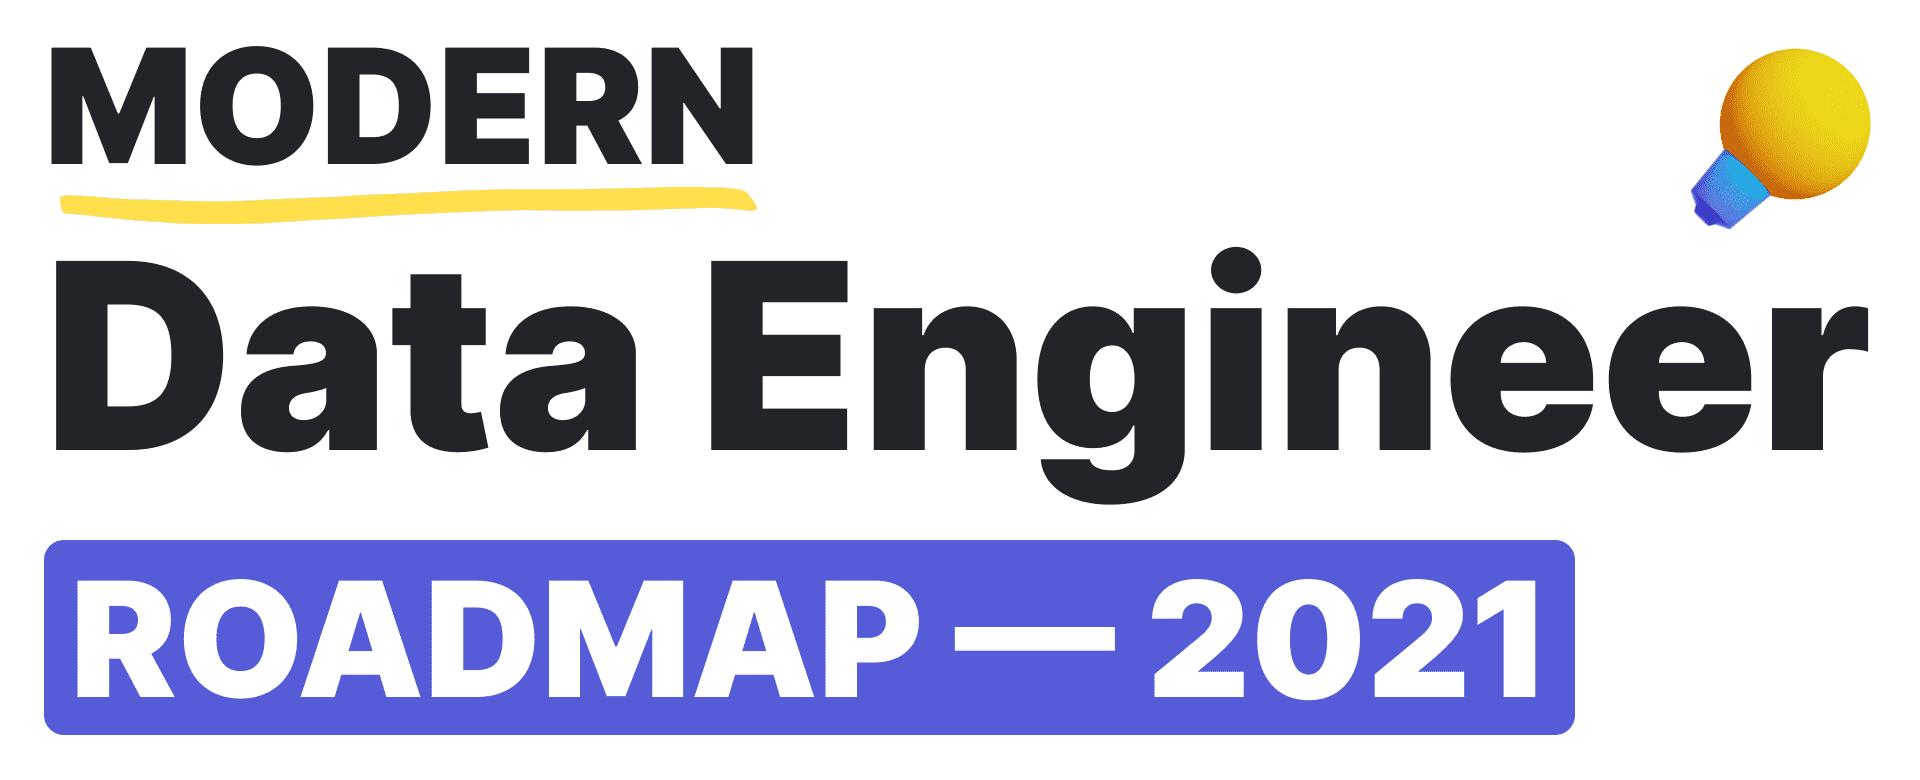 2021 Modern Data Engineer Roadmap